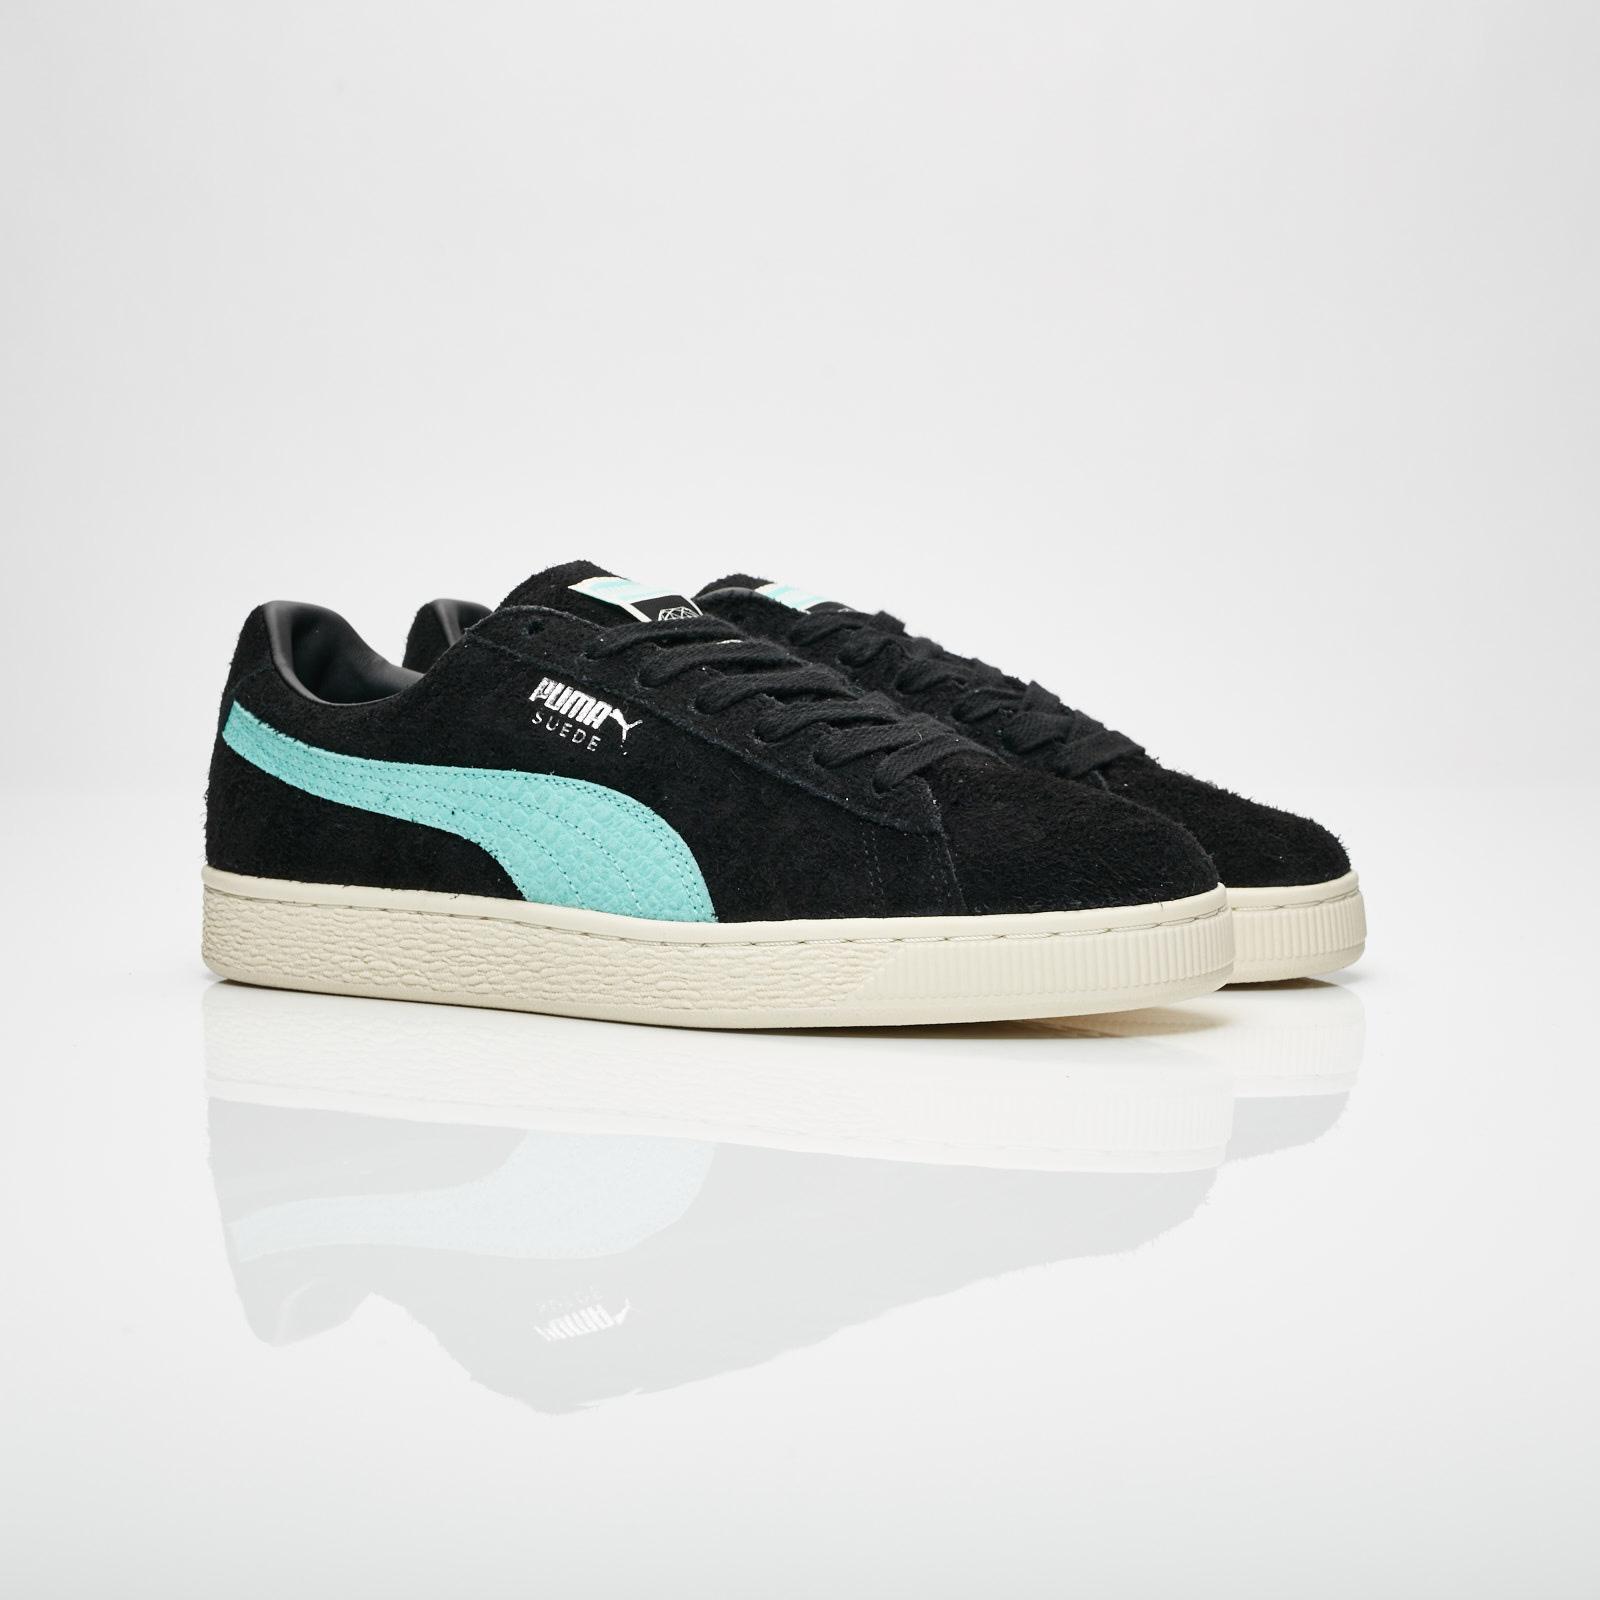 Puma Suede Diamond | Black | Sneakers | 365650 01 | Caliroots